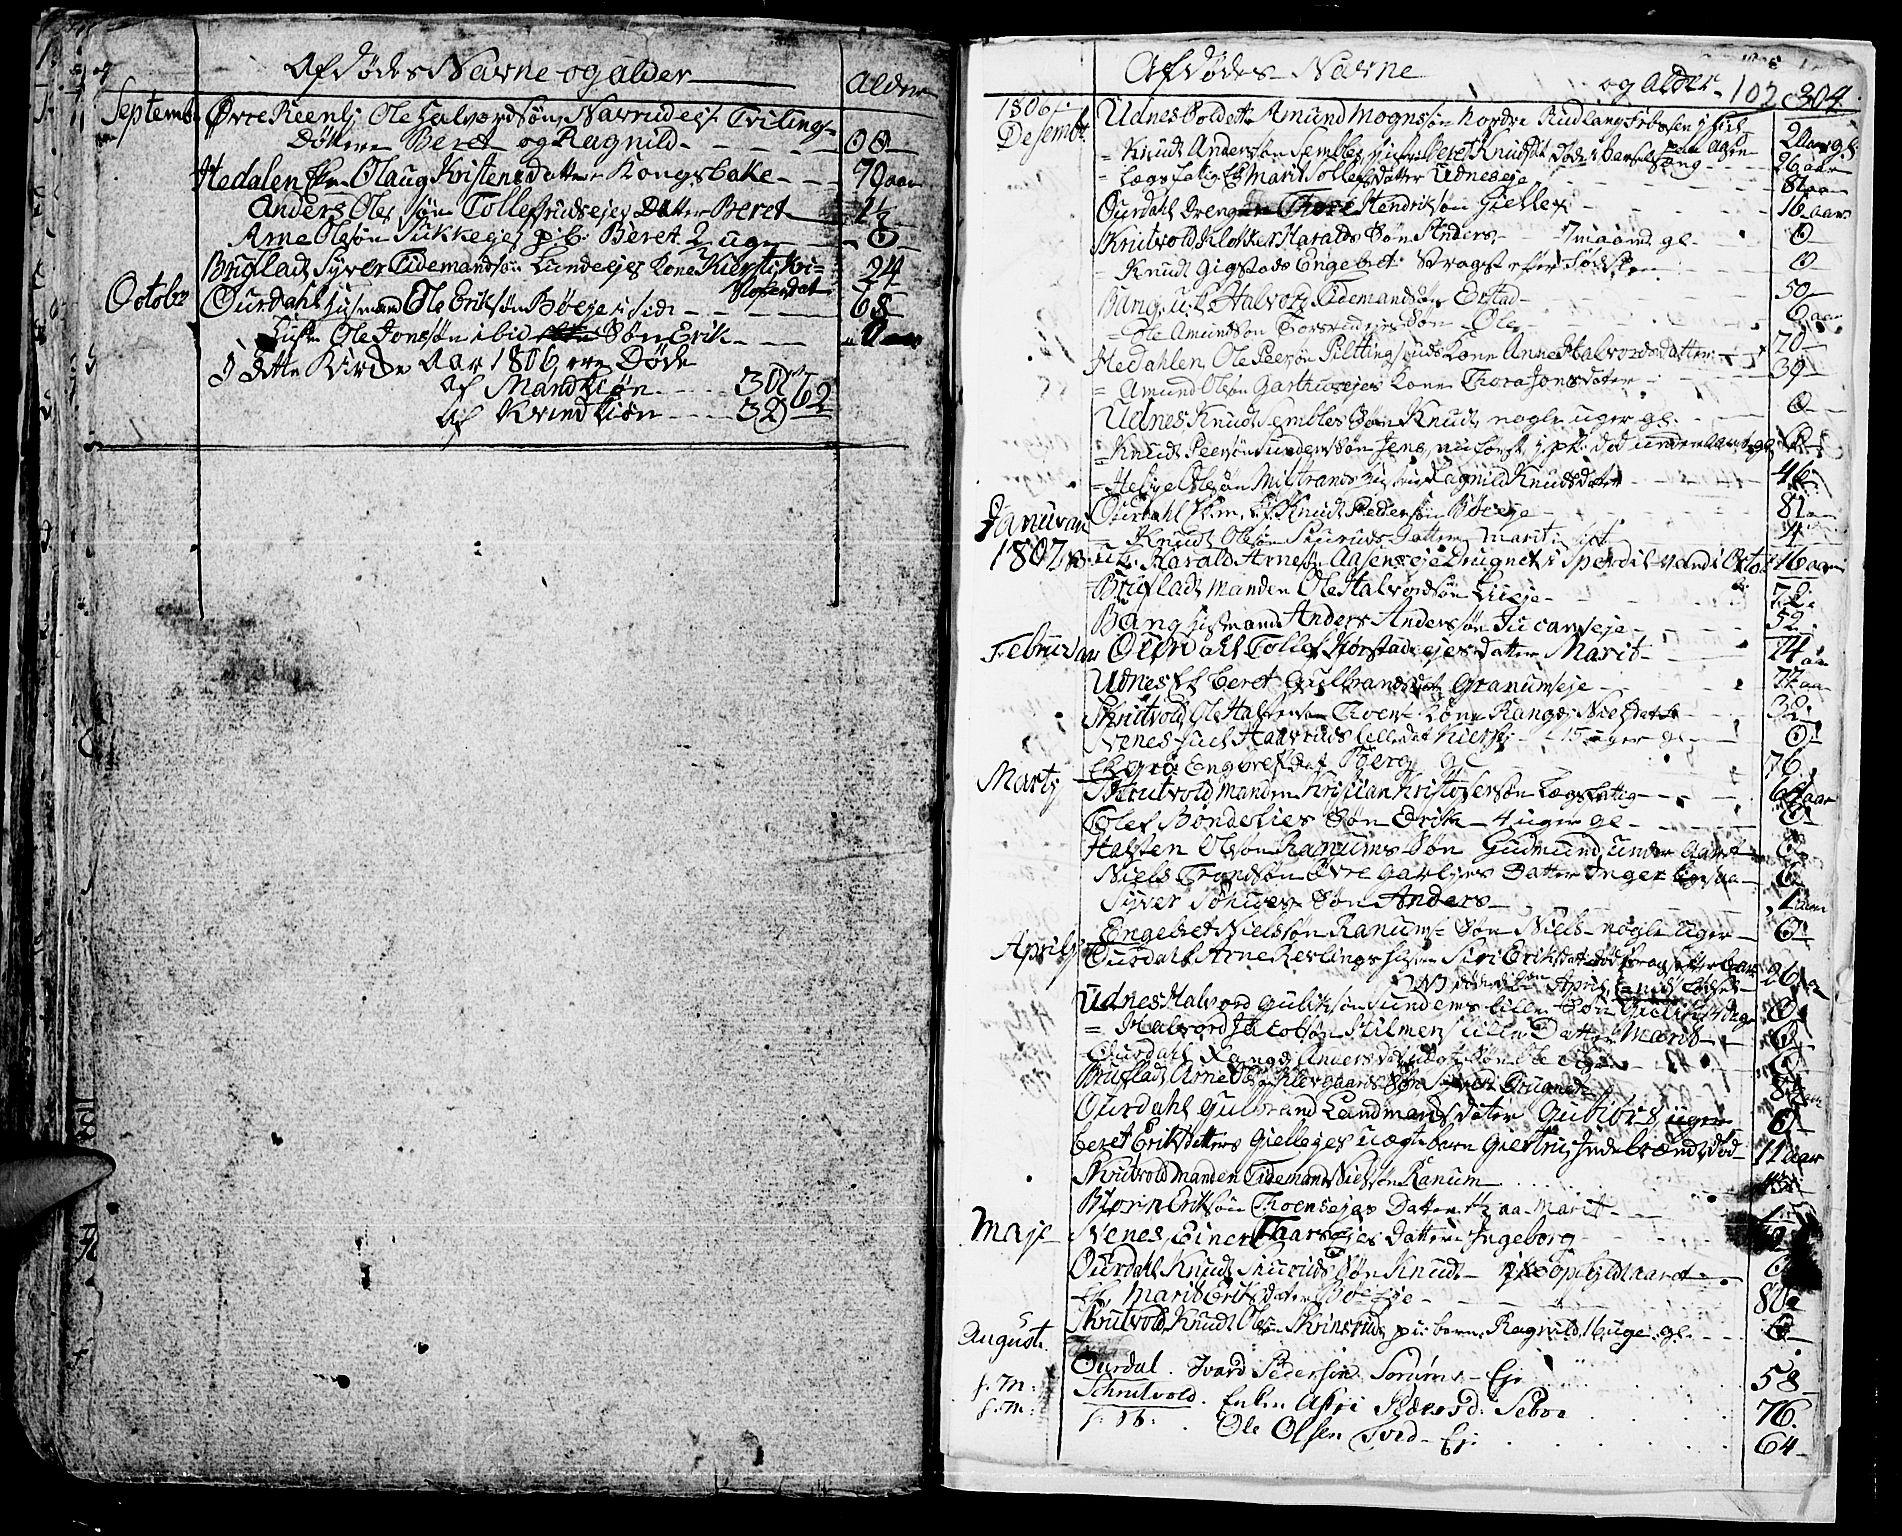 SAH, Aurdal prestekontor, Ministerialbok nr. 7, 1800-1808, s. 102